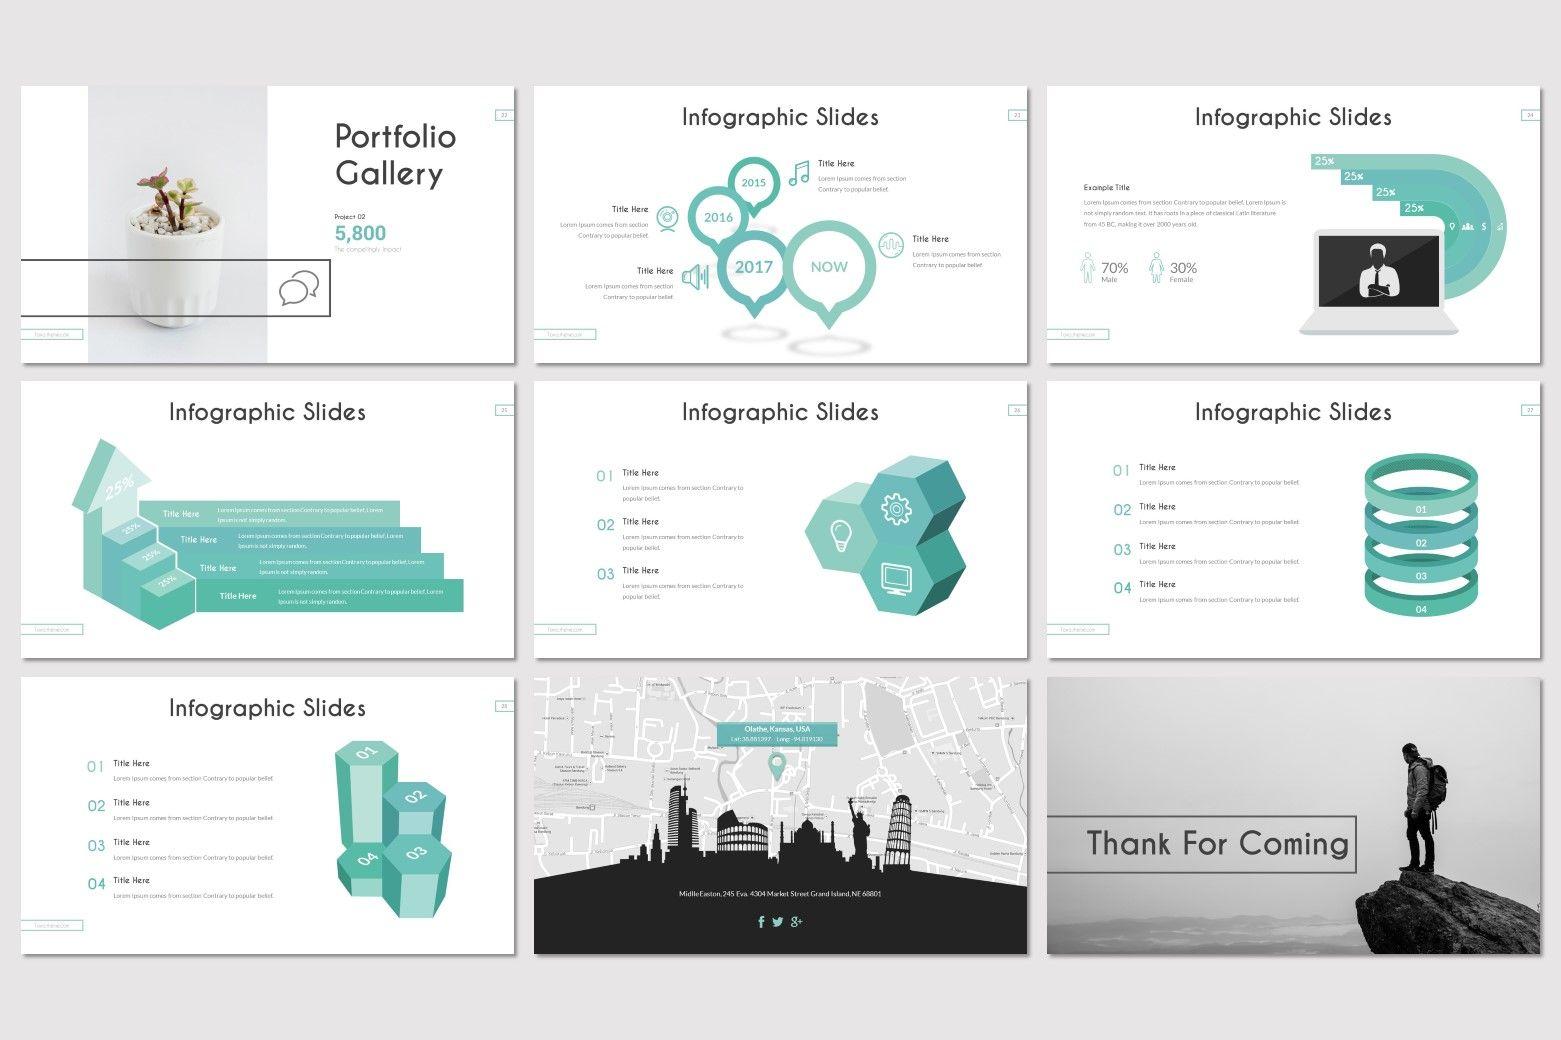 Toxa - Google Slides Template, Slide 5, 08519, Presentation Templates — PoweredTemplate.com